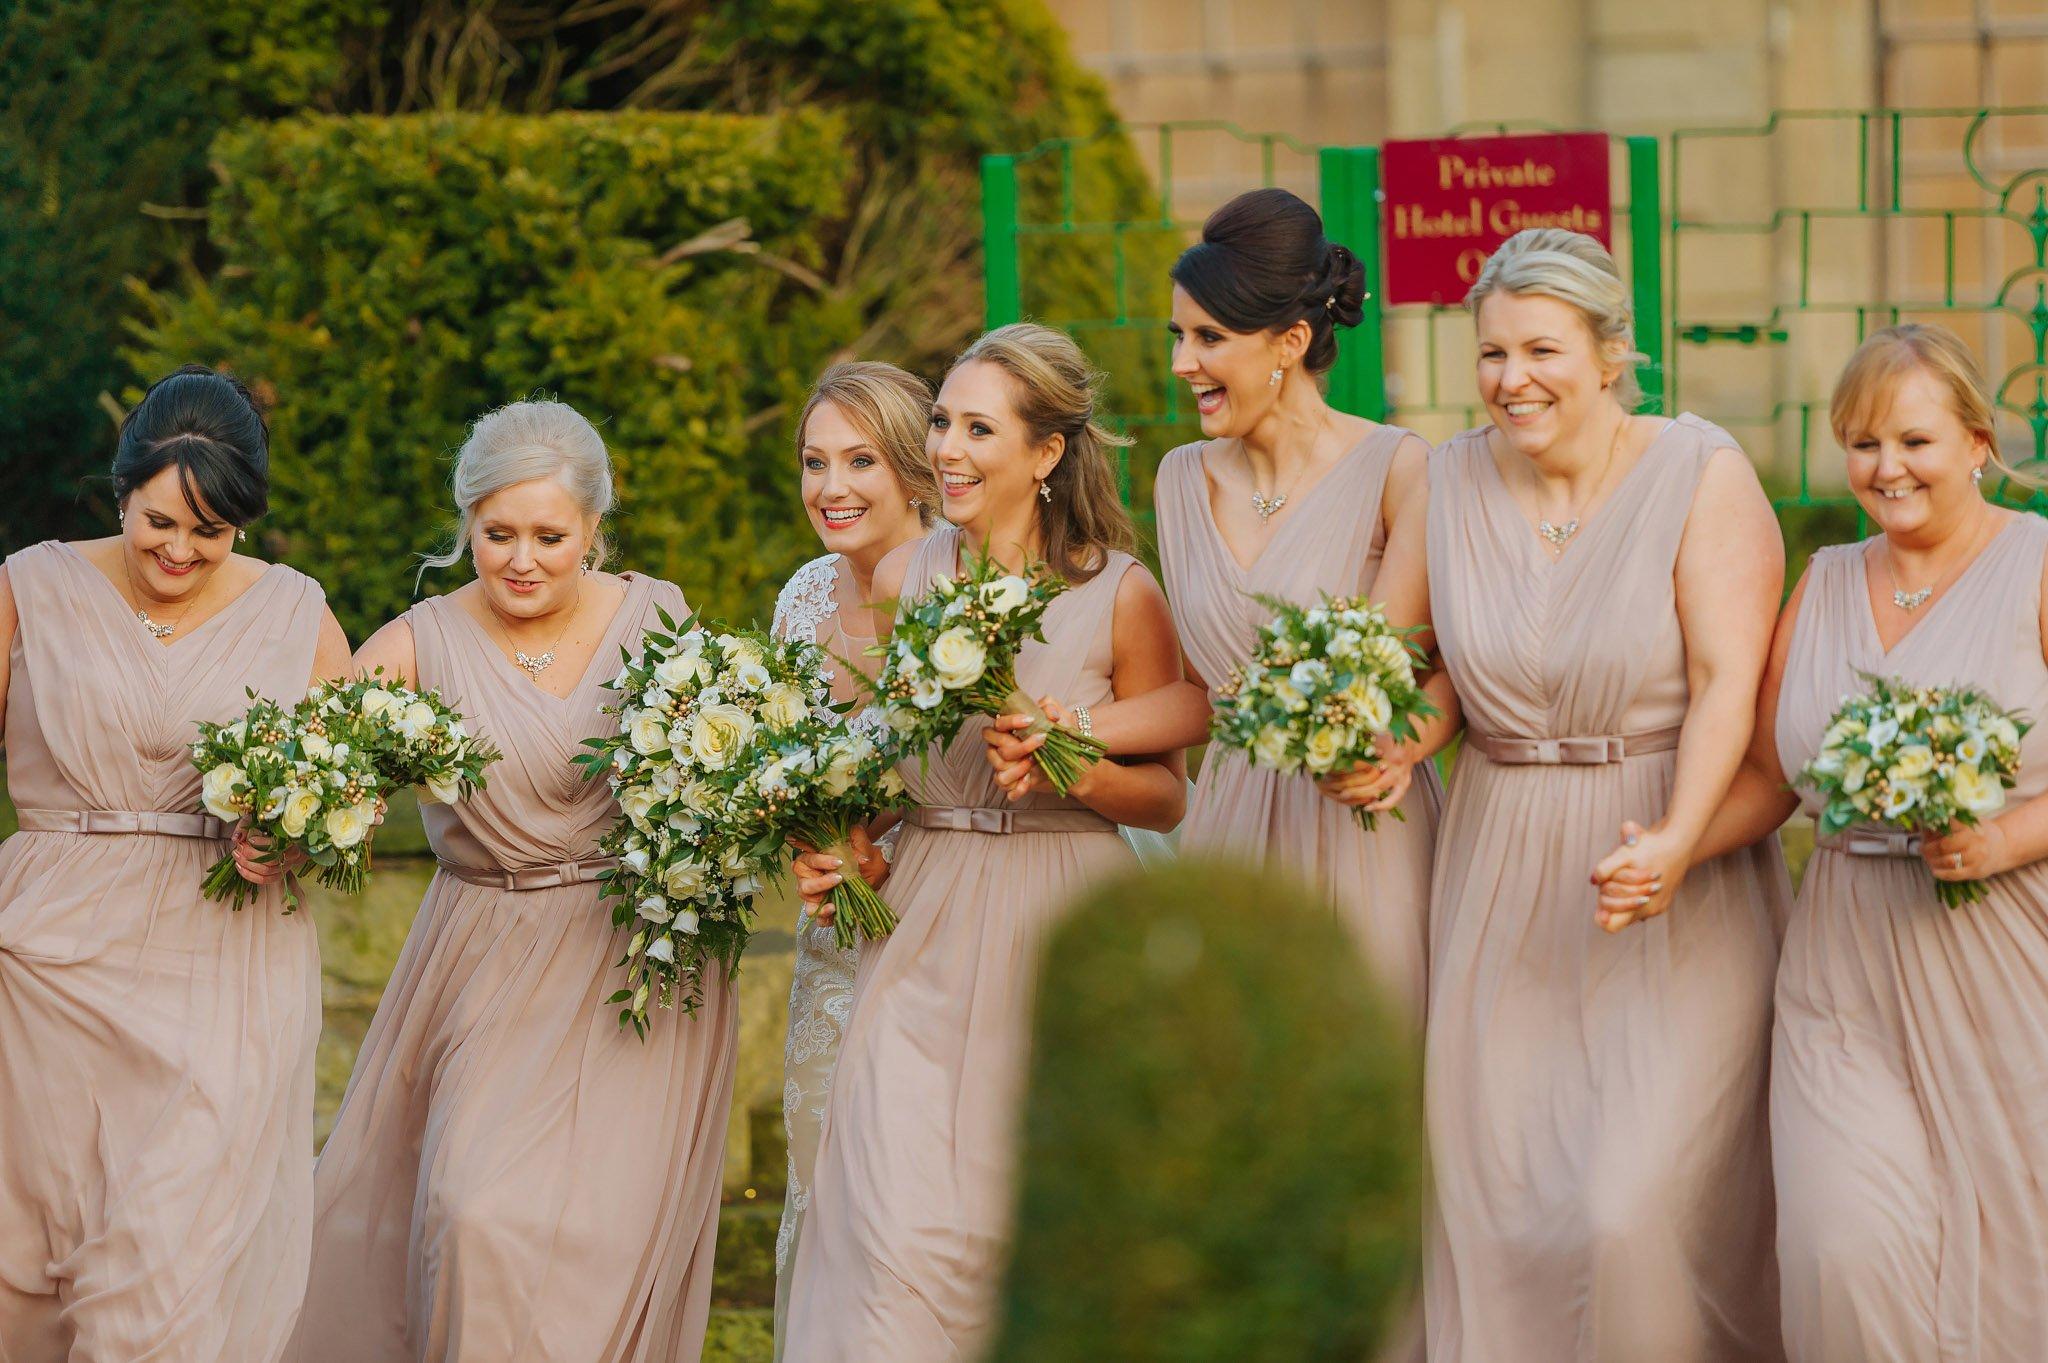 Coombe Abbey wedding in Coventry, Warwickshire - Sam + Matt 36